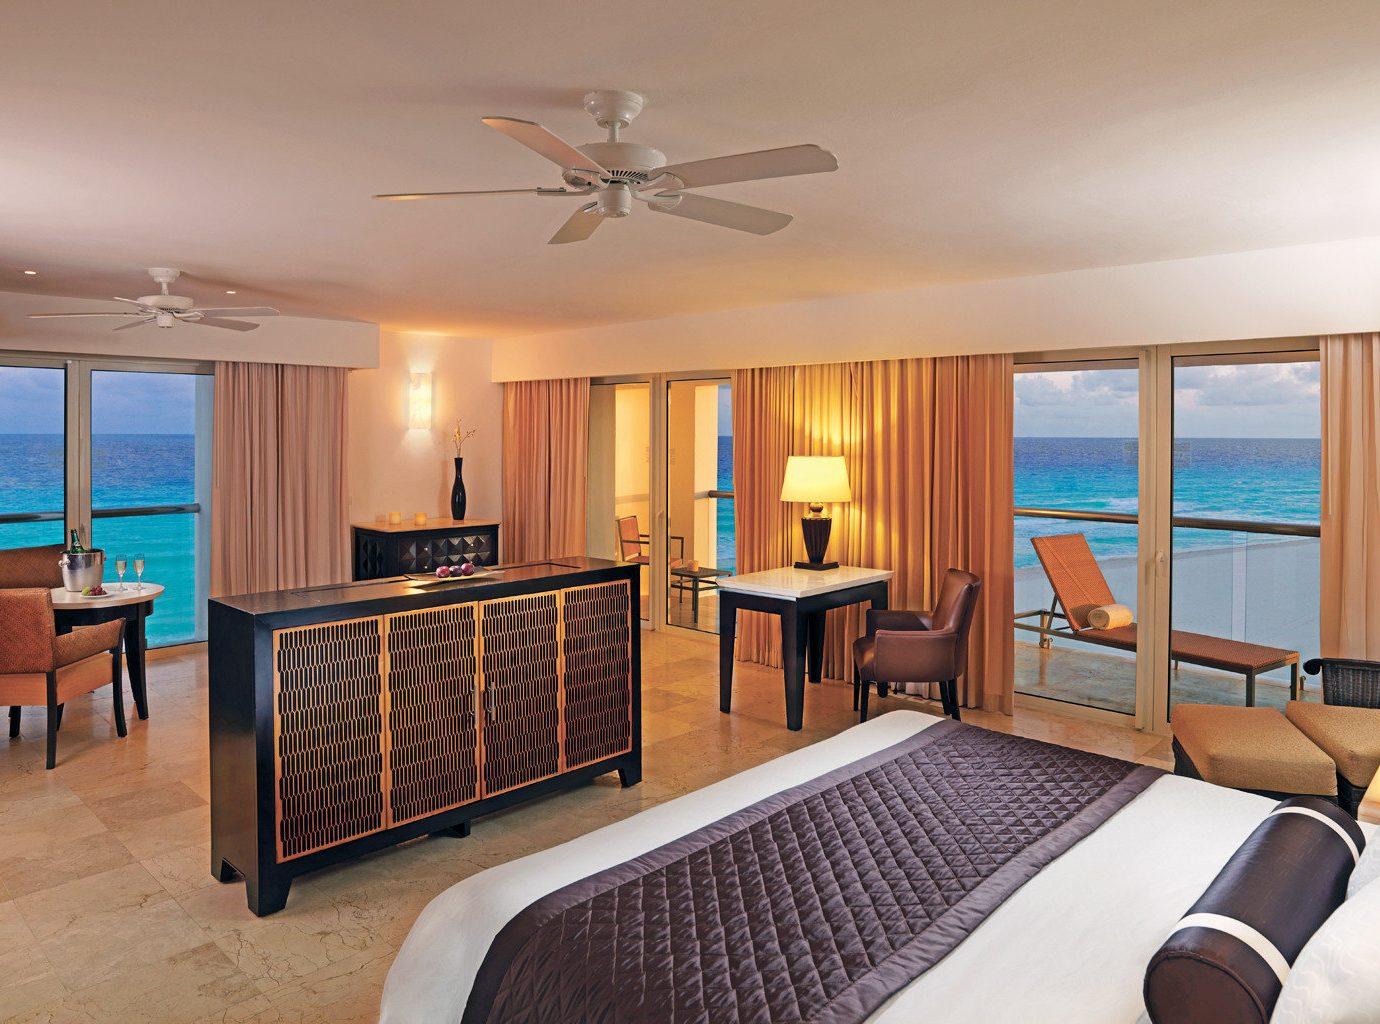 Bedroom at Le Blanc Spa Resort